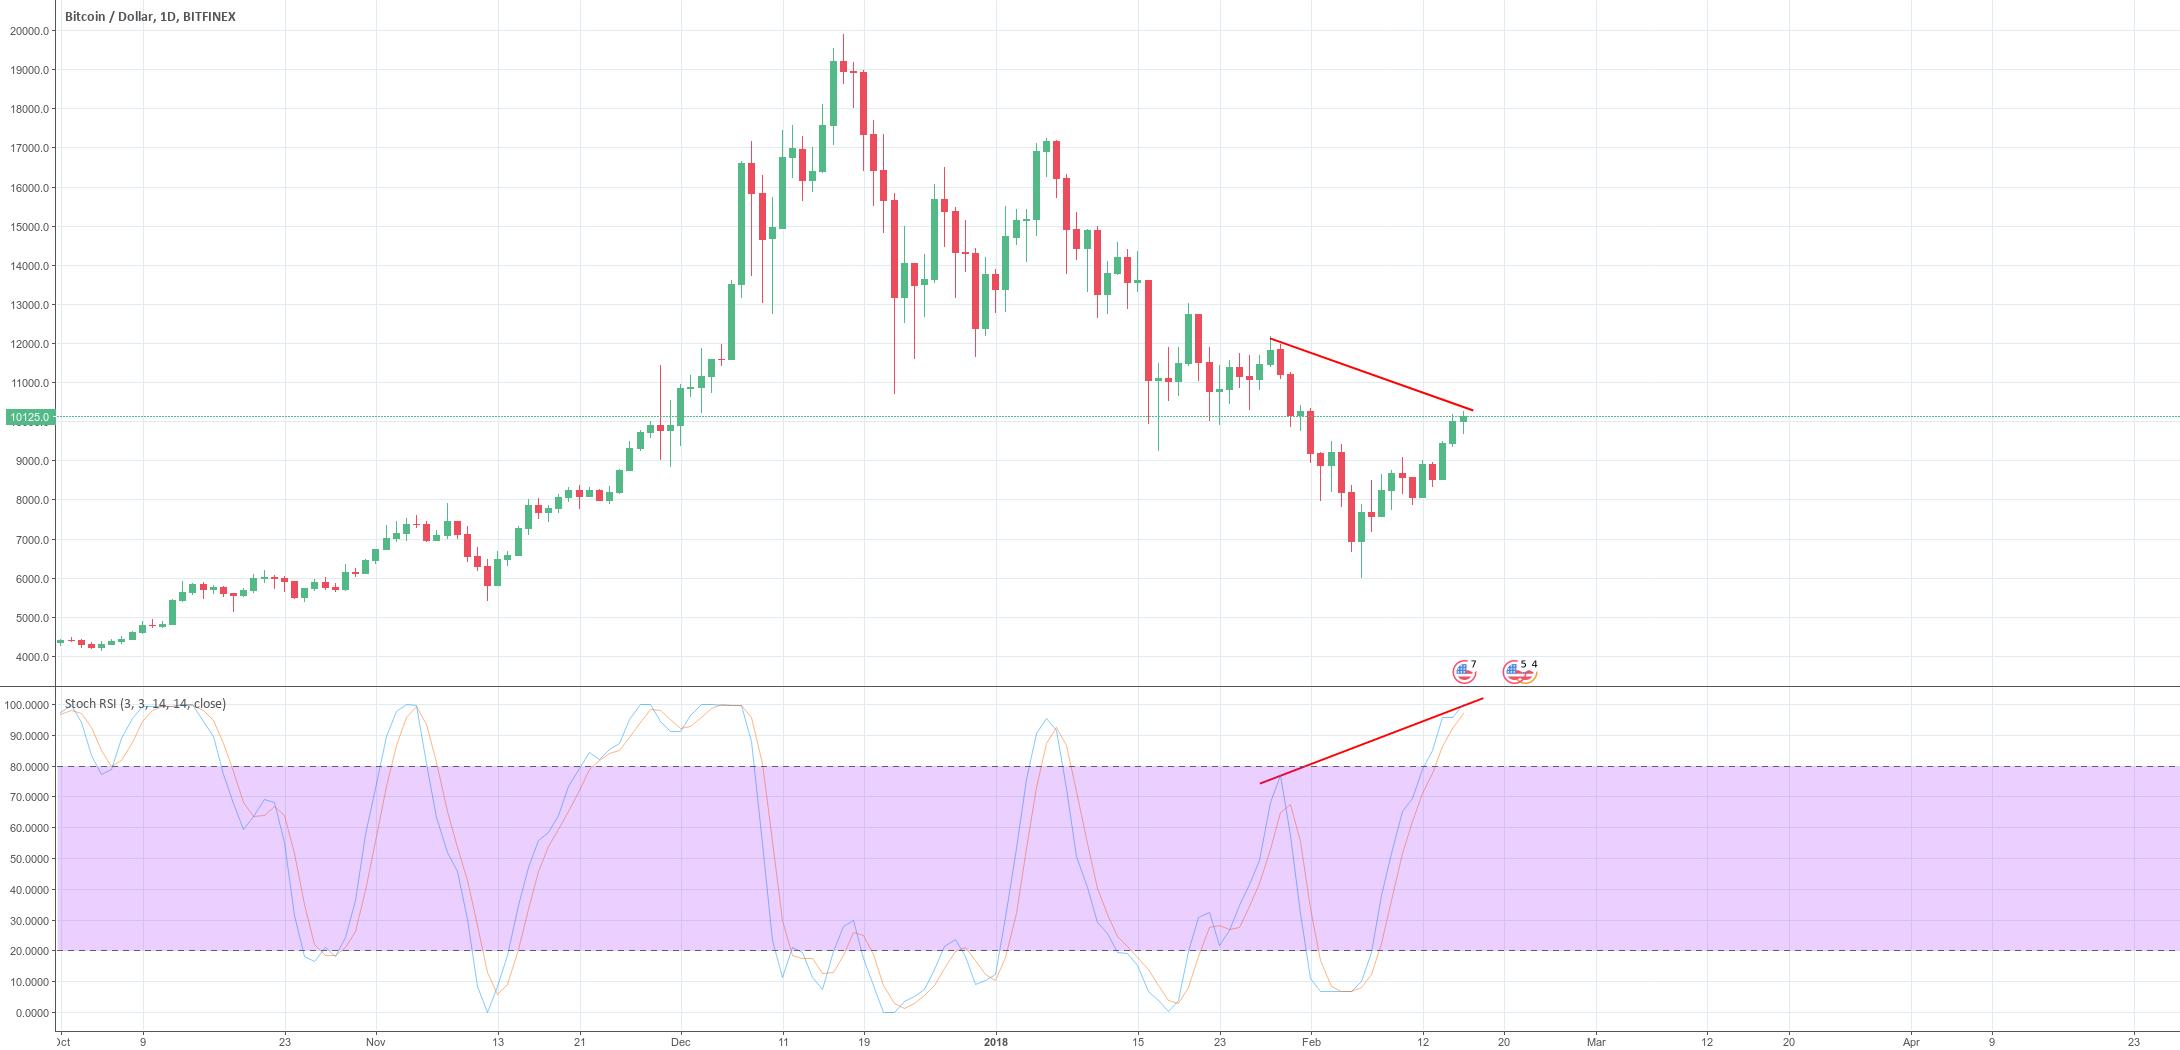 Hidden Bearish Divergence on Daily Bitcoin Chart